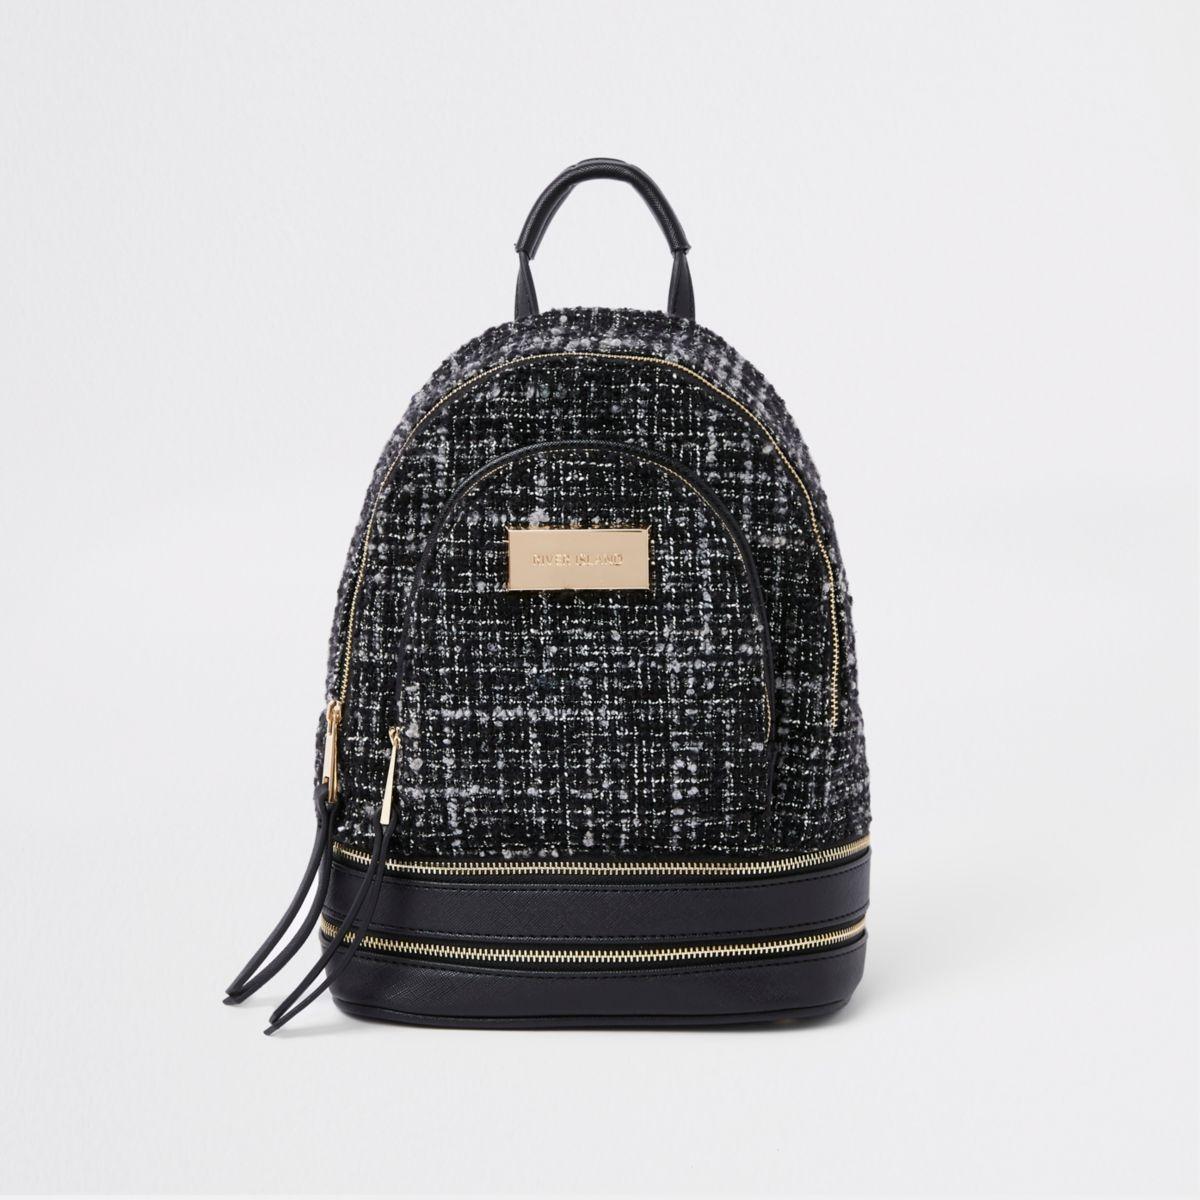 Black boucle mini backpack